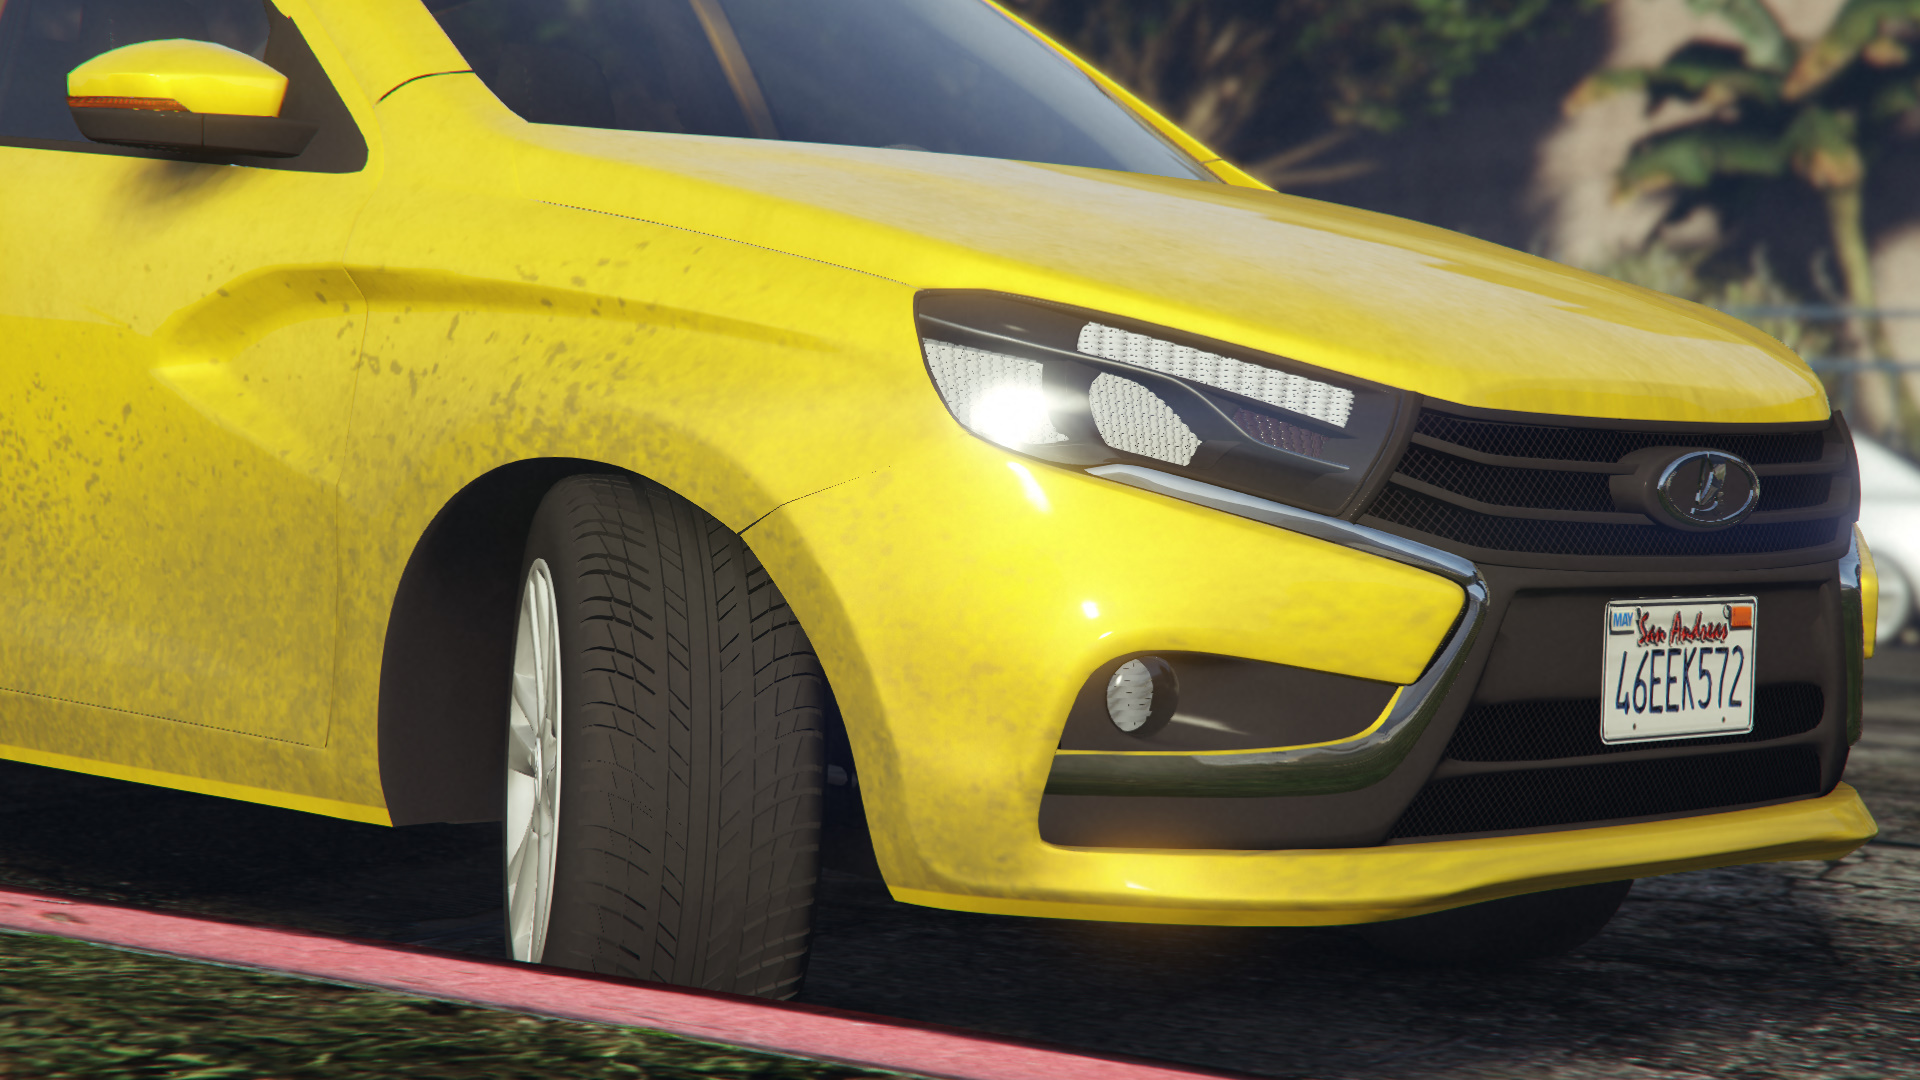 2015 Lada Vesta для GTA V - Скриншот 2